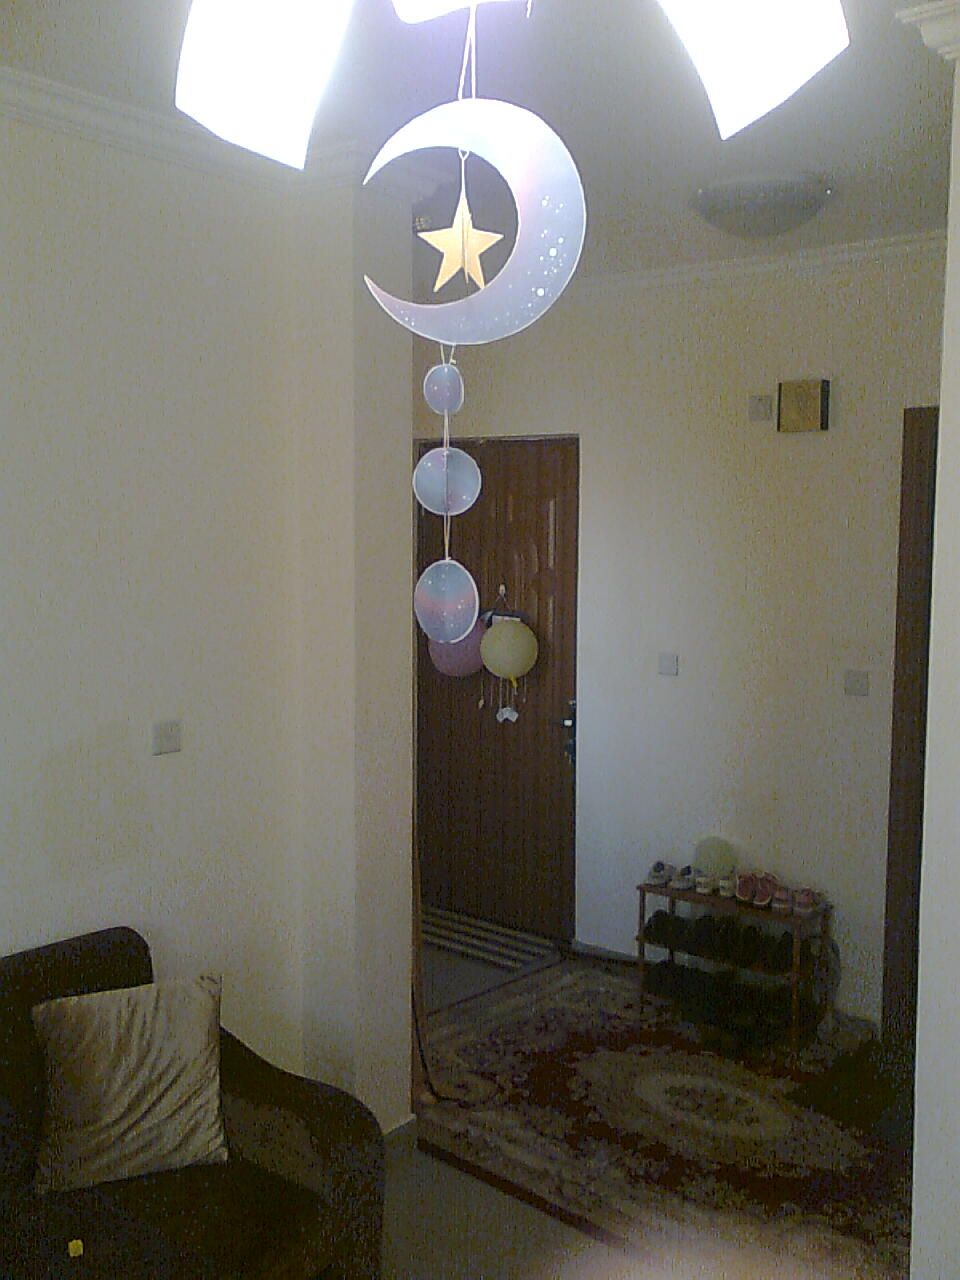 Wonderful Preschool Eid Al-Fitr Decorations - 81c4d4538fd61c6ab628cf6f0e2a8097  Photograph_721578 .jpg